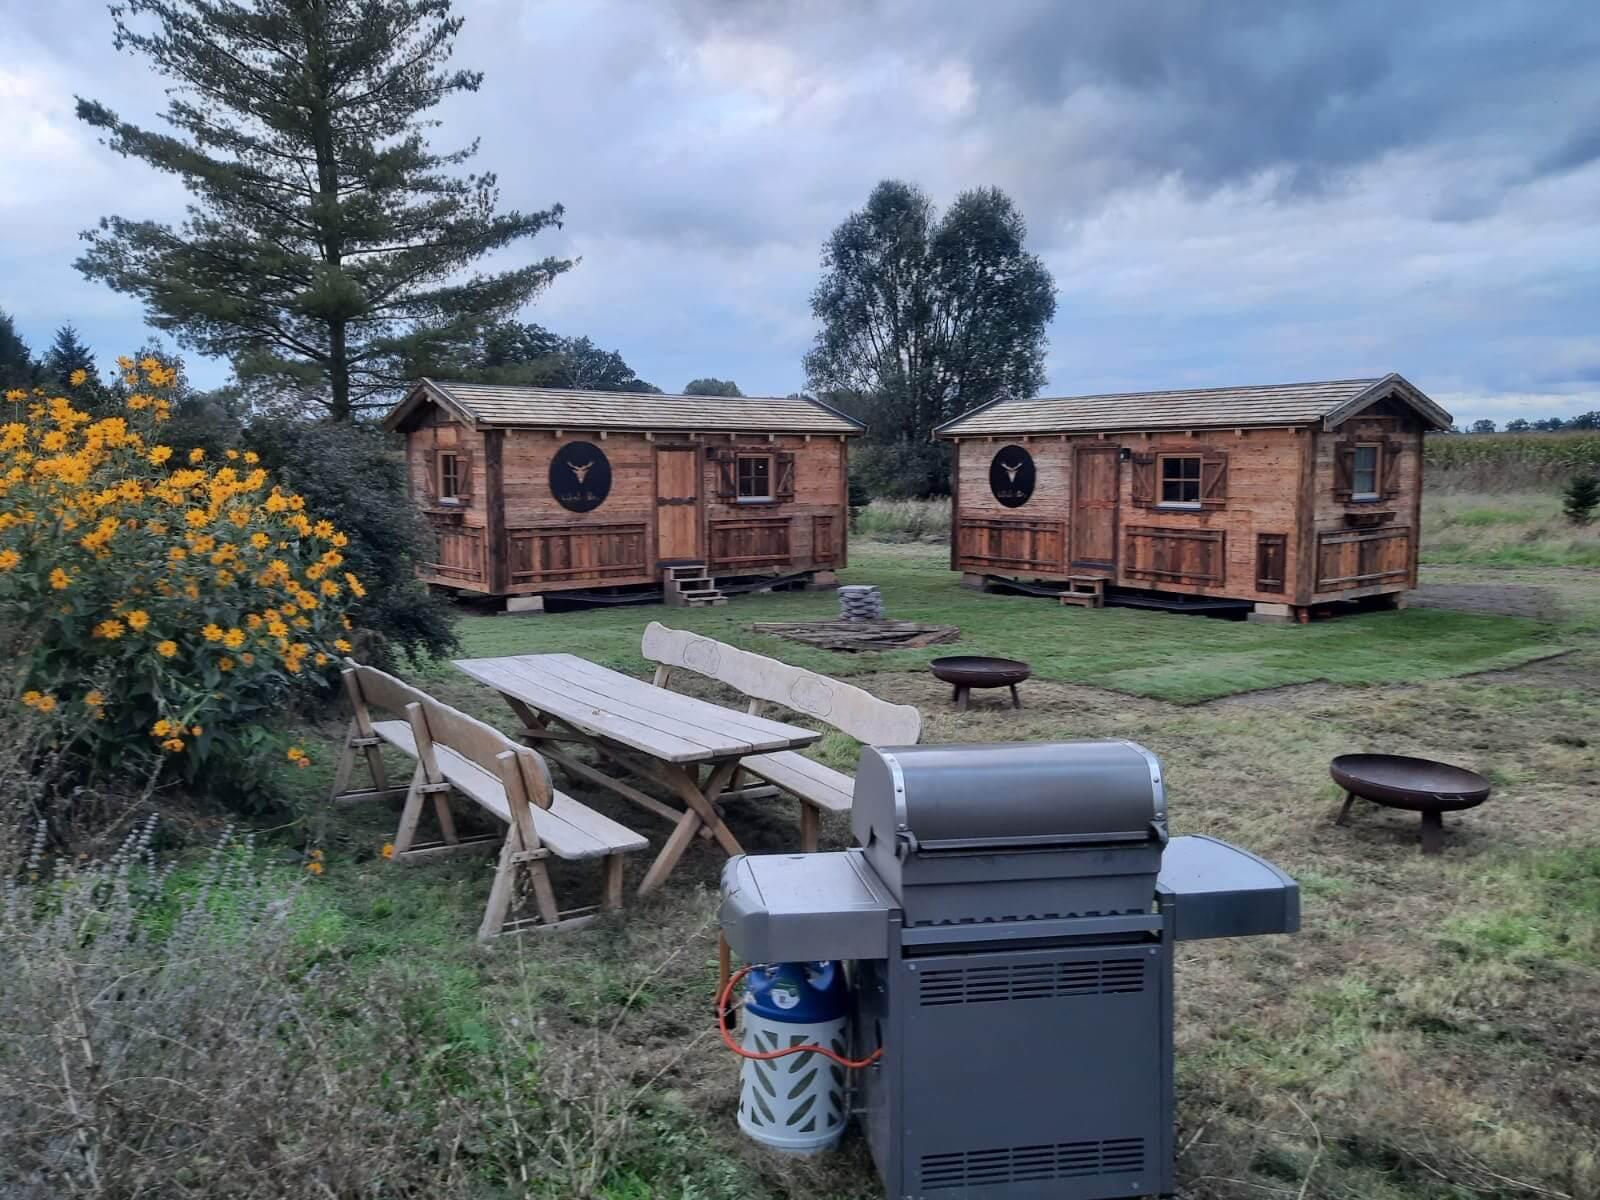 mobiles-chalet-almhuette-modell 2-vital-camp-gmbh